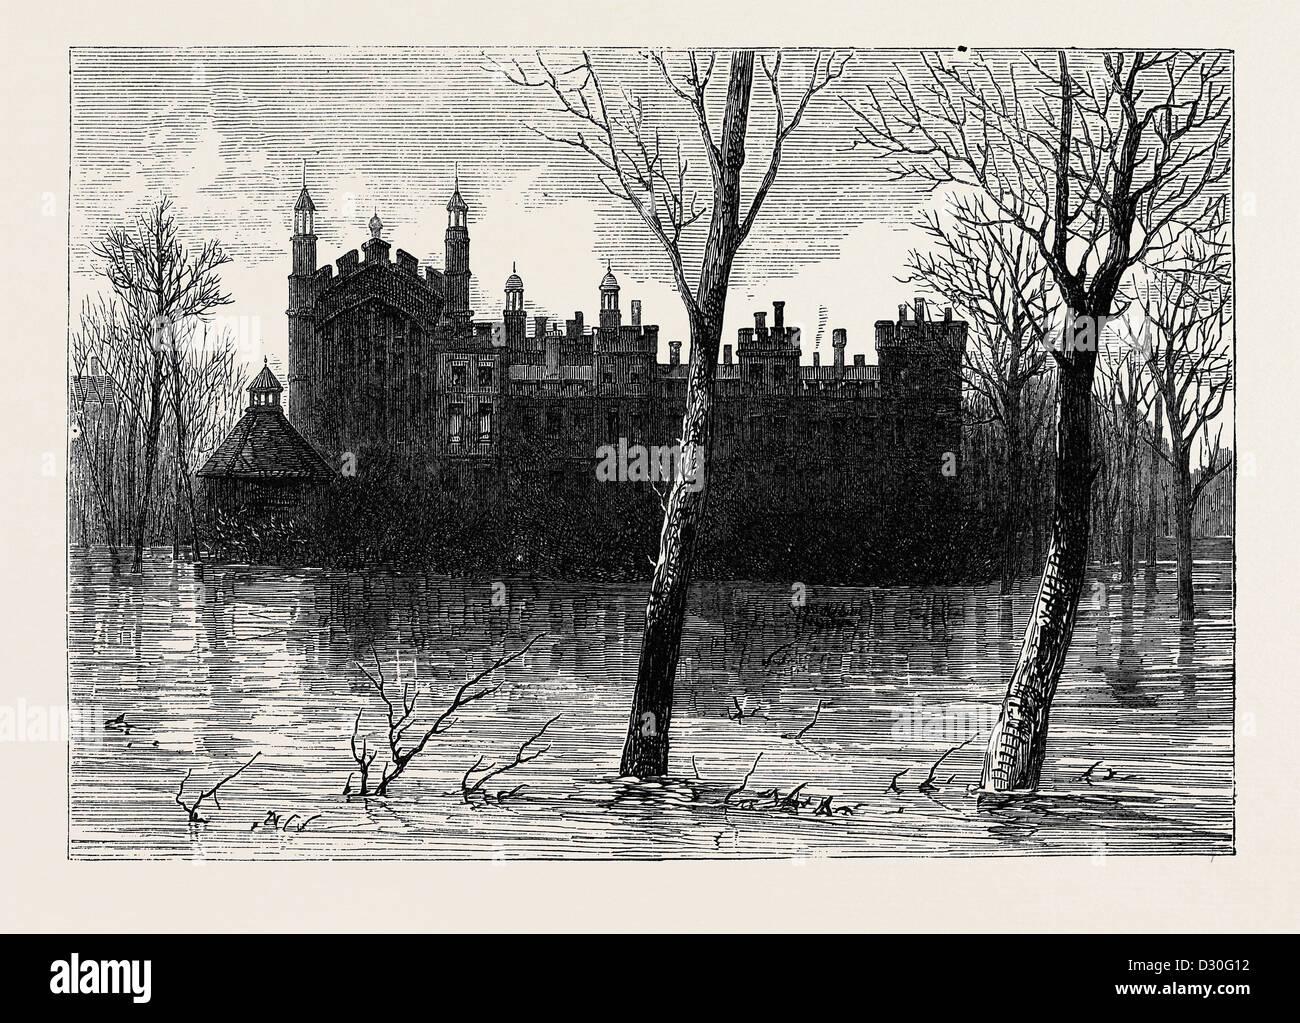 THE FLOODS: SCENE AT ETON - Stock Image